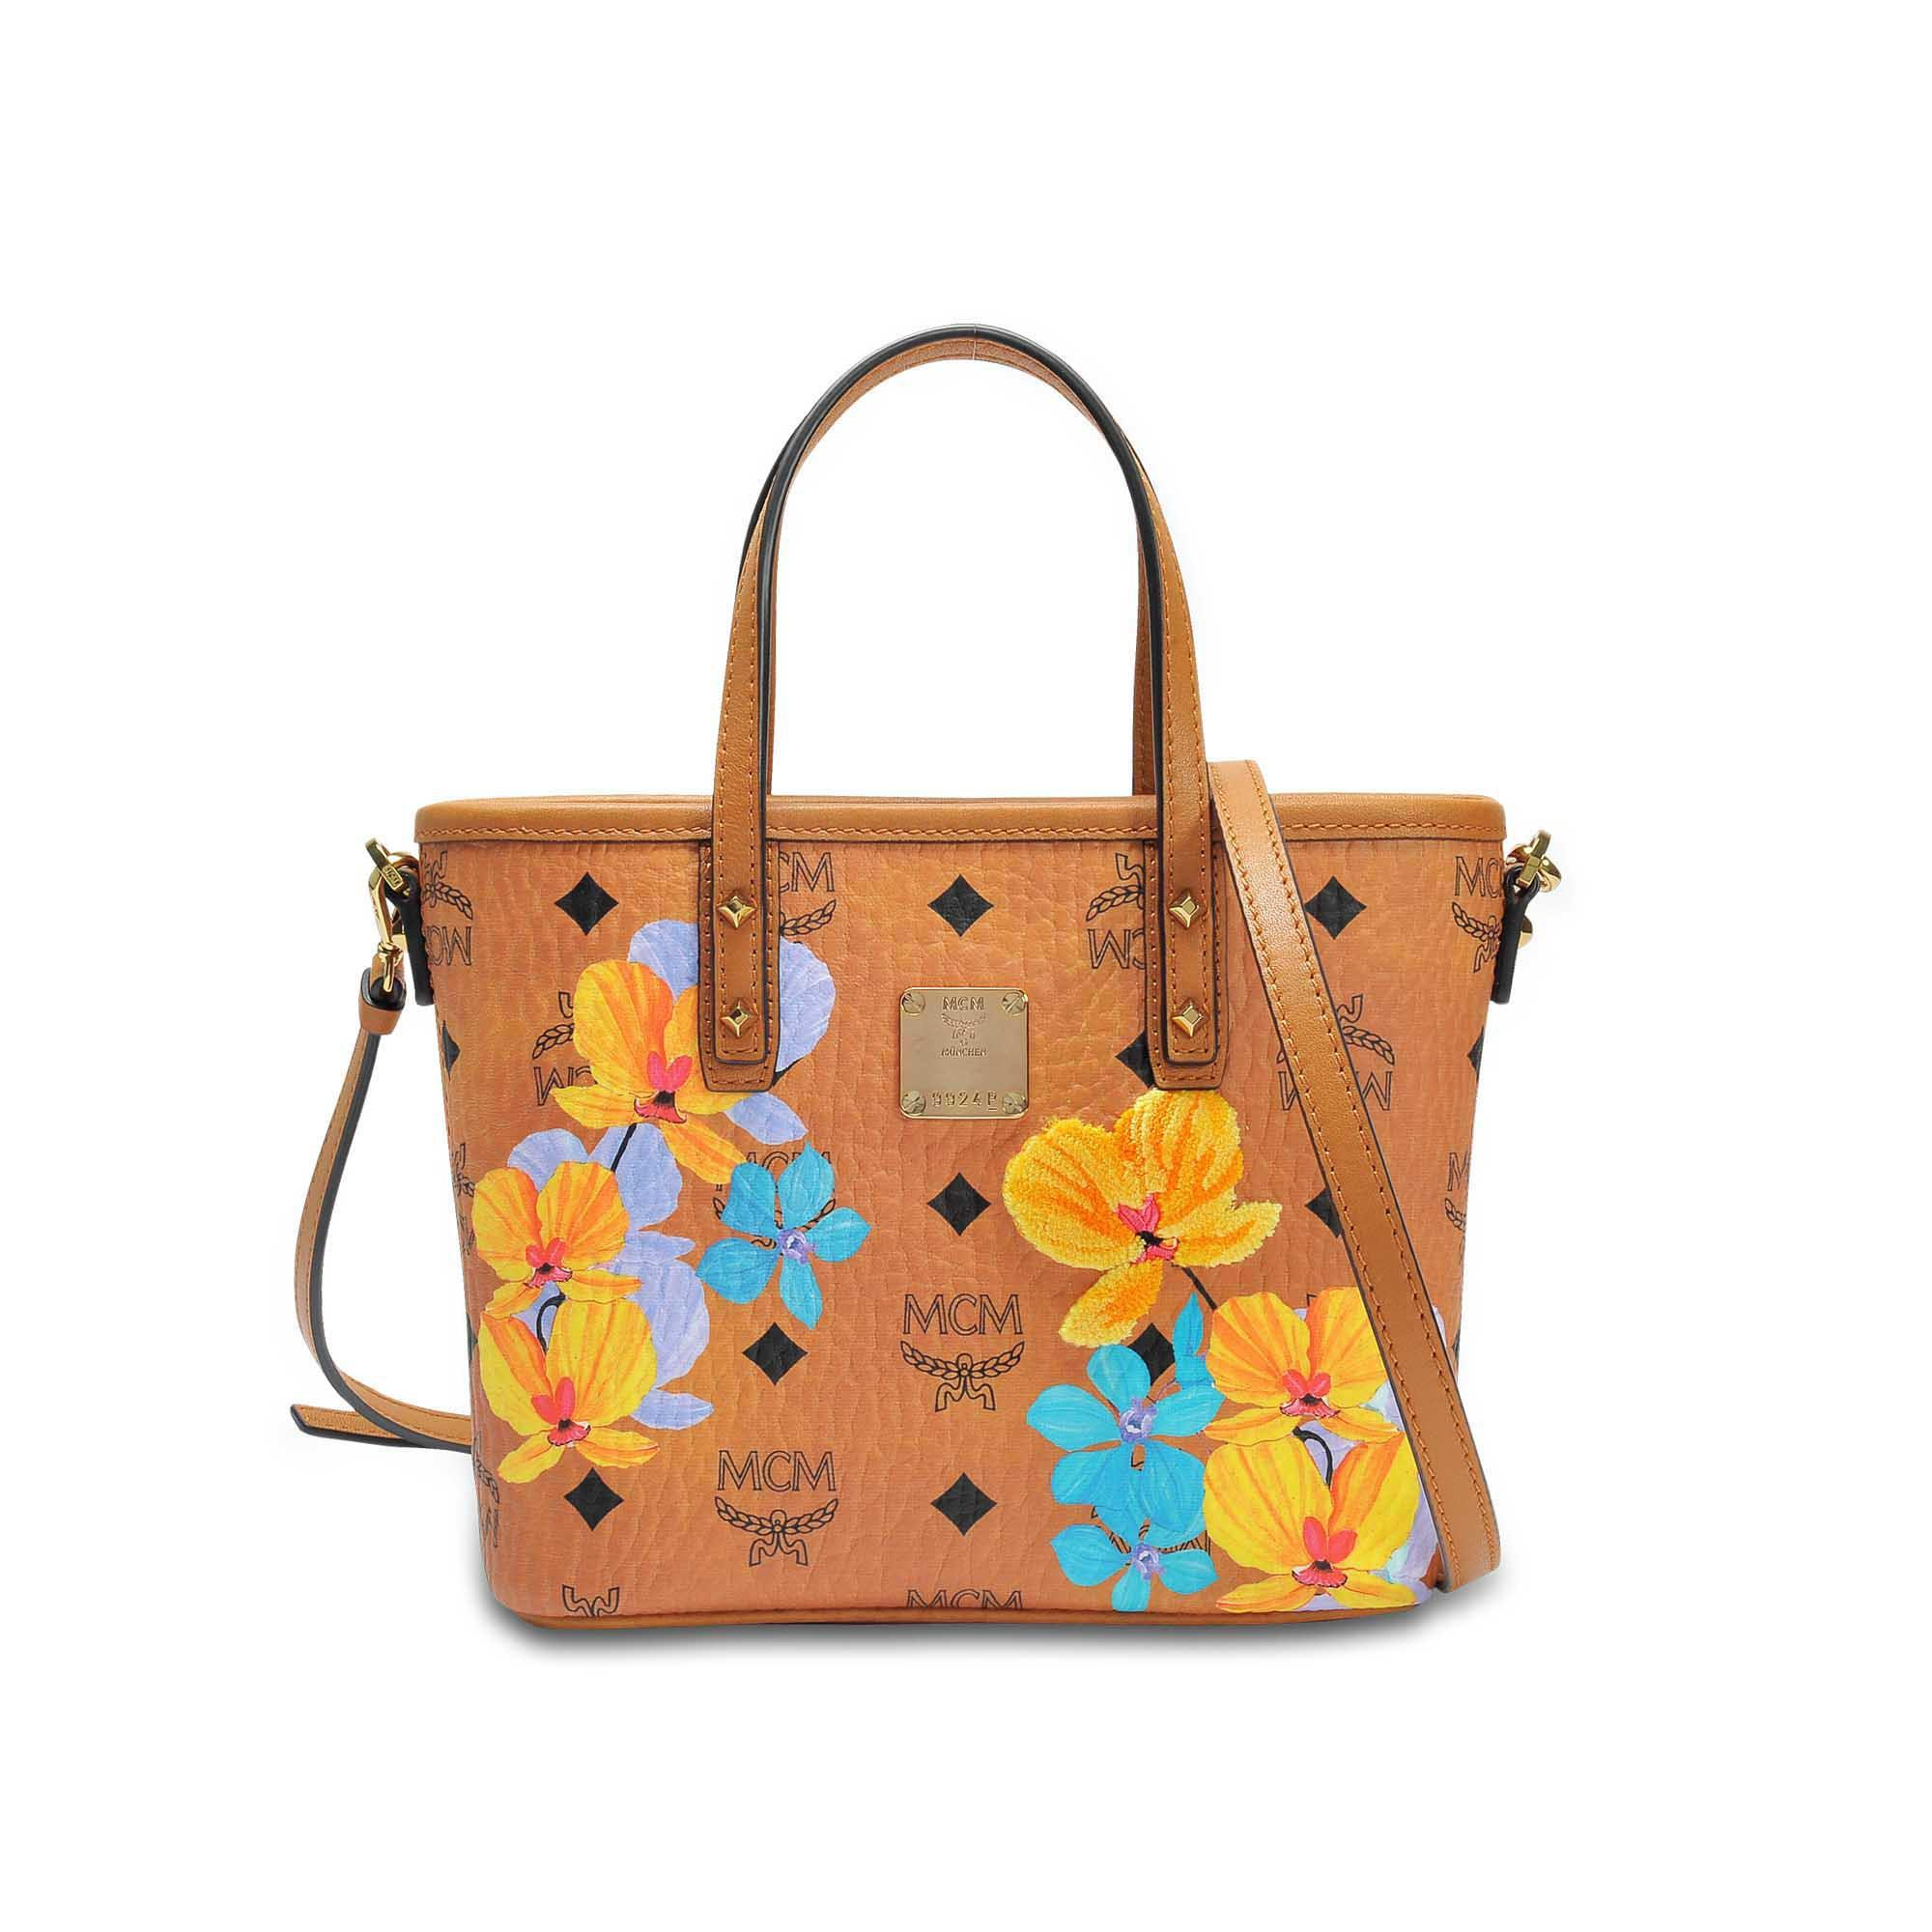 Flower Mini Crossbody Bag in Cognac Coated Cotton MCM 048WQDM6i